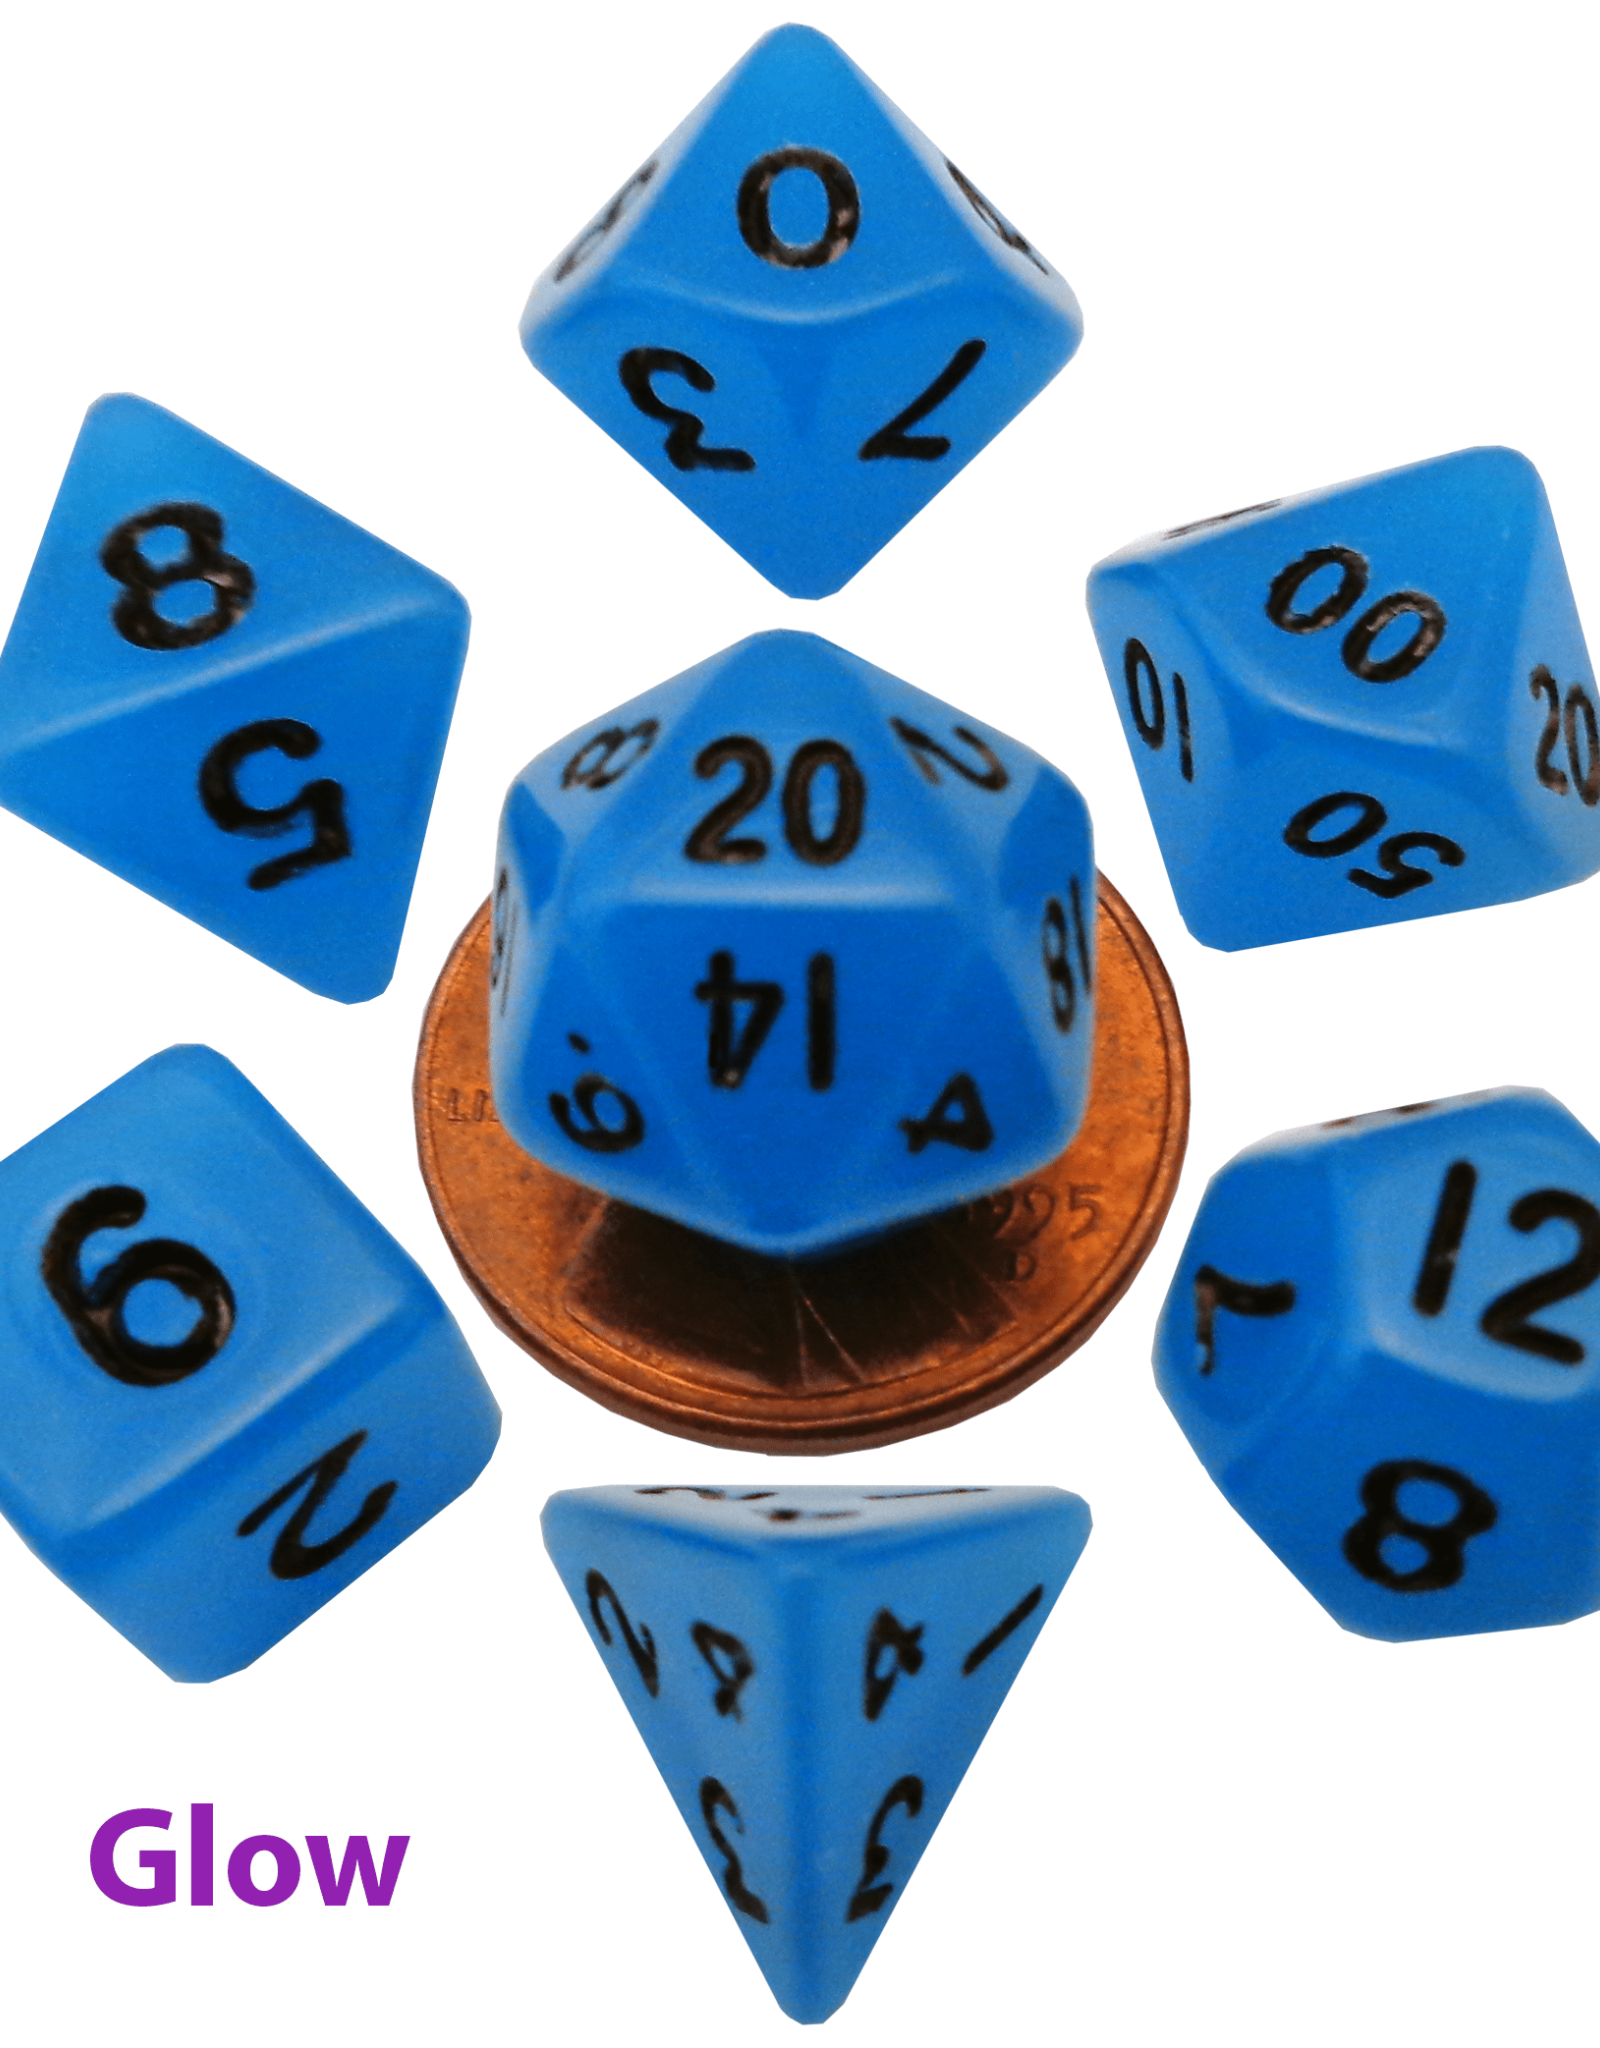 Metallic Dice Game Glow in the Dark Blue Dice 7 Set